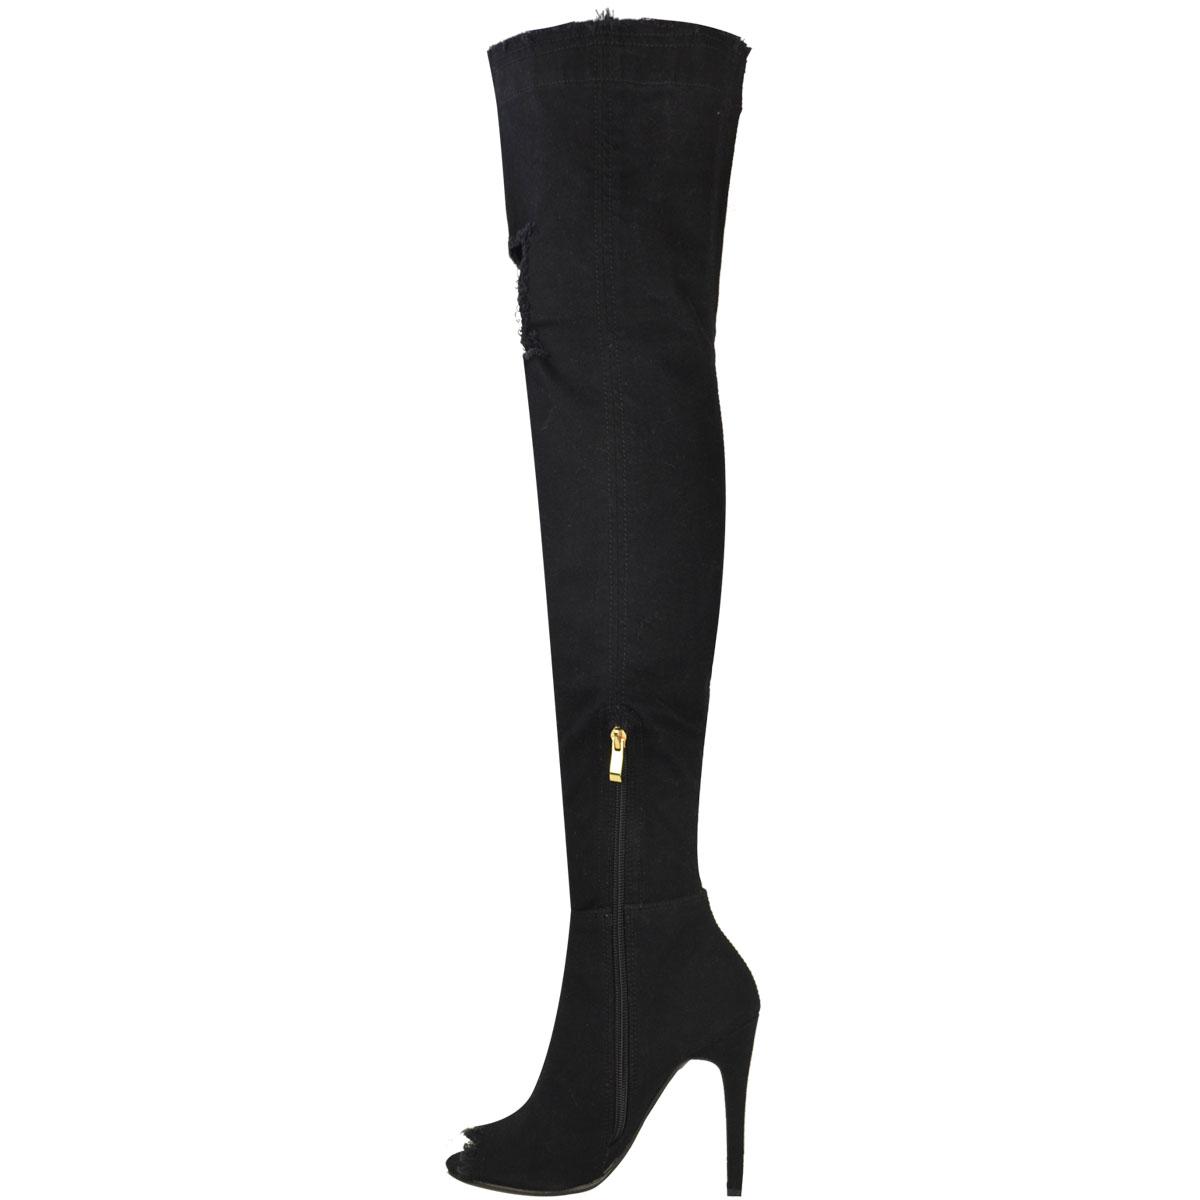 damen overknee stiefel stiletto absatz high heels aus. Black Bedroom Furniture Sets. Home Design Ideas